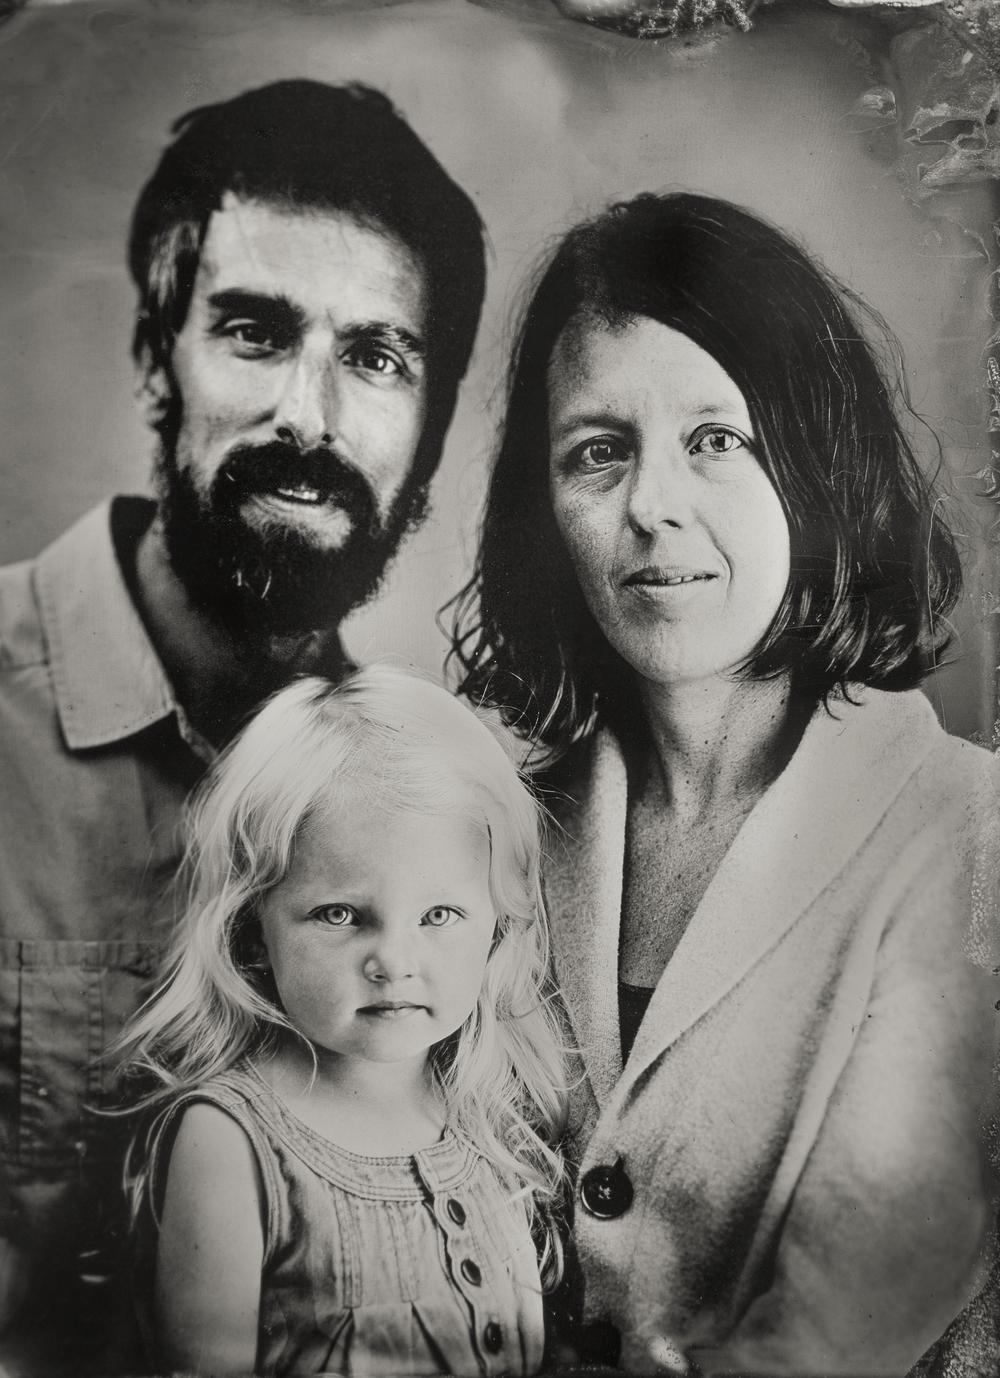 Mansfield Family, 2015 by Kari Orvik